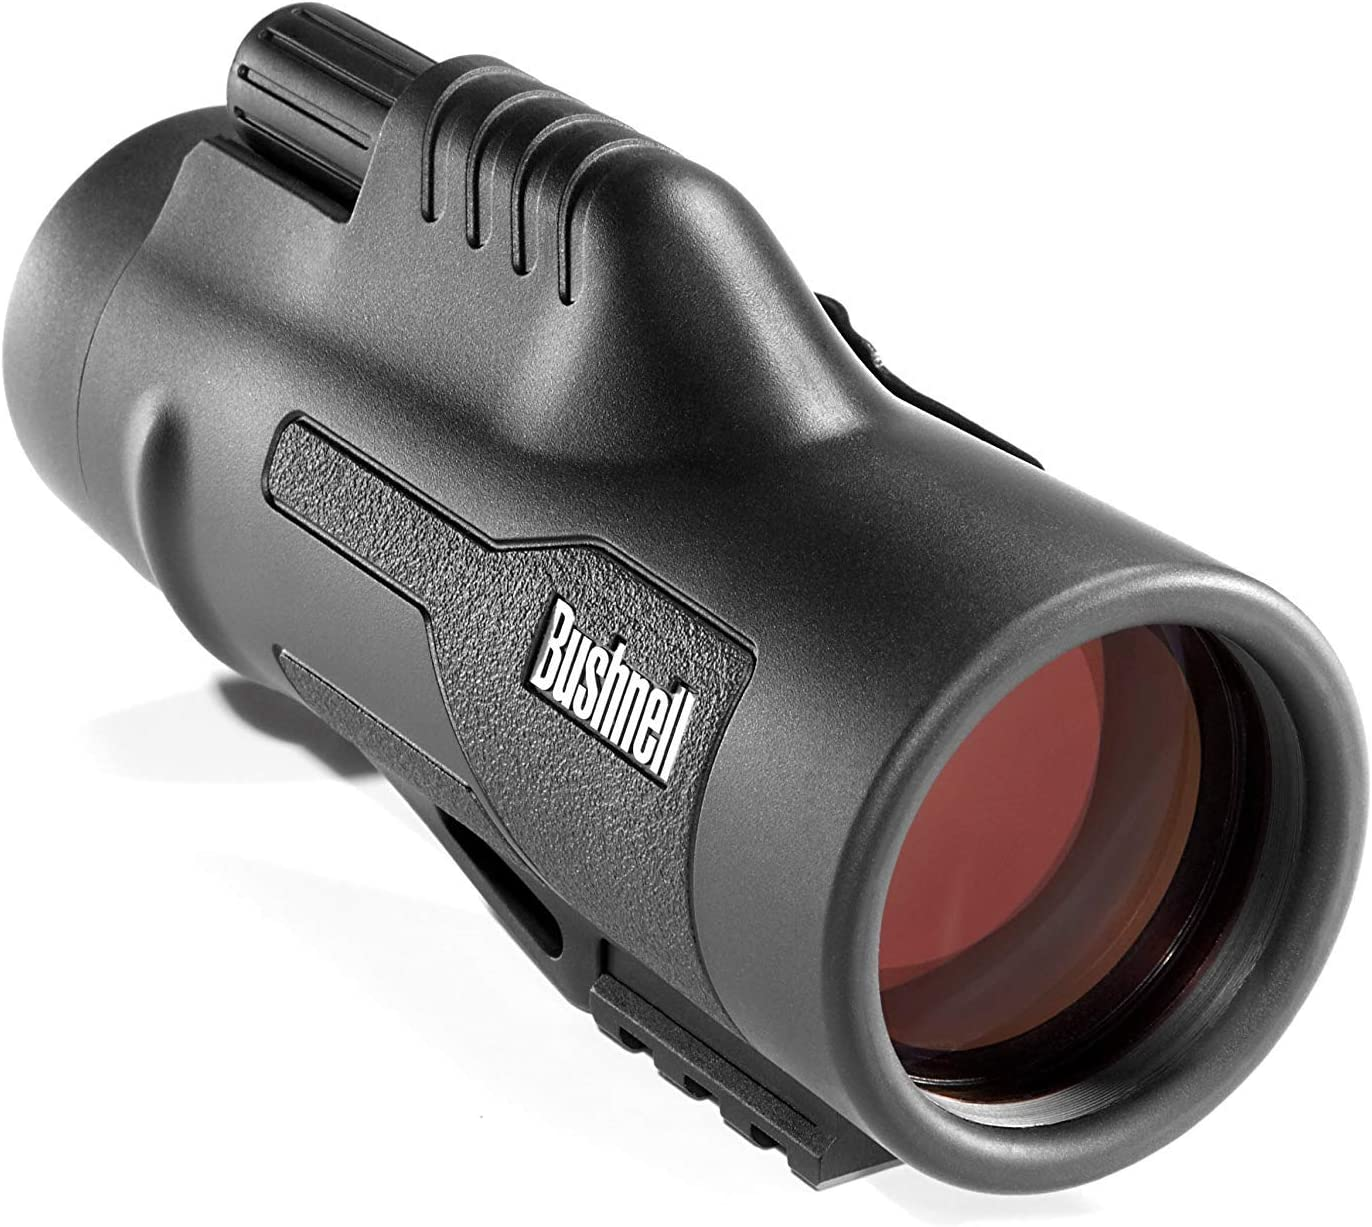 Bushnell Legend Ultra HD 単眼鏡 ブラック 10 x 42-mm  PACK OF 3